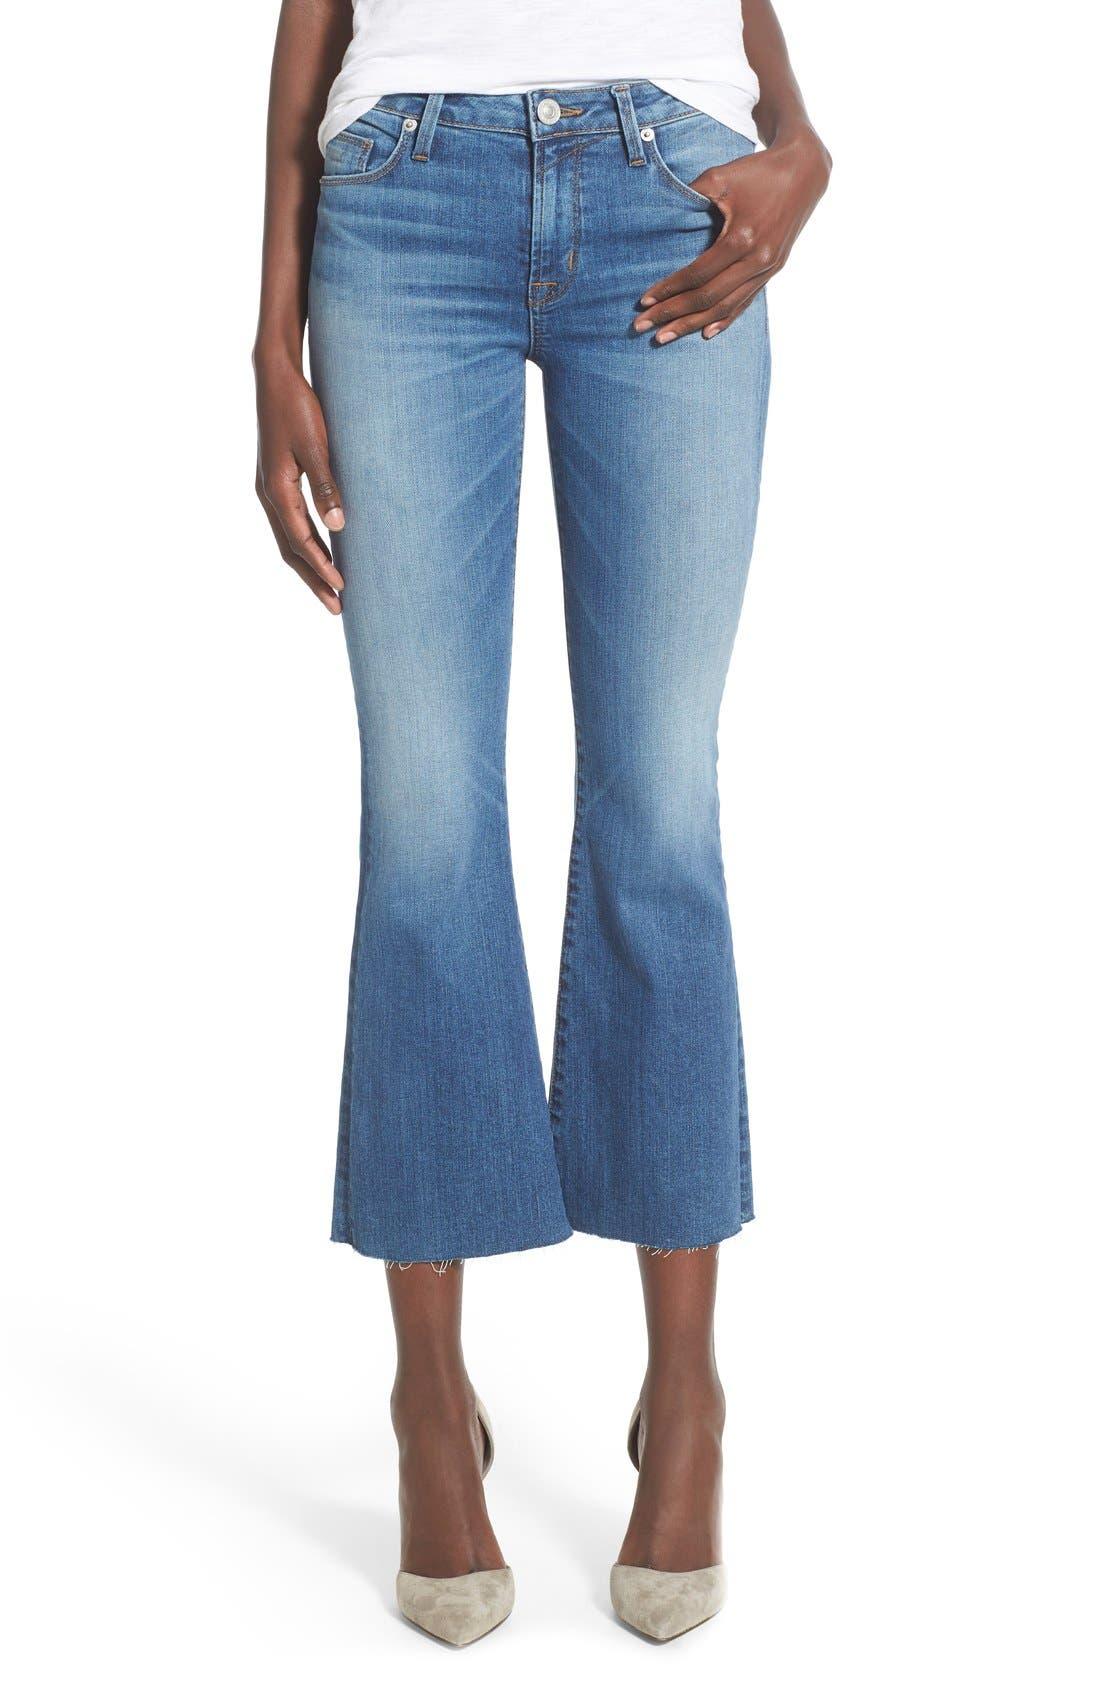 Alternate Image 1 Selected - Hudson Jeans 'Mia' Raw Hem Crop Flare Jeans (Carve)